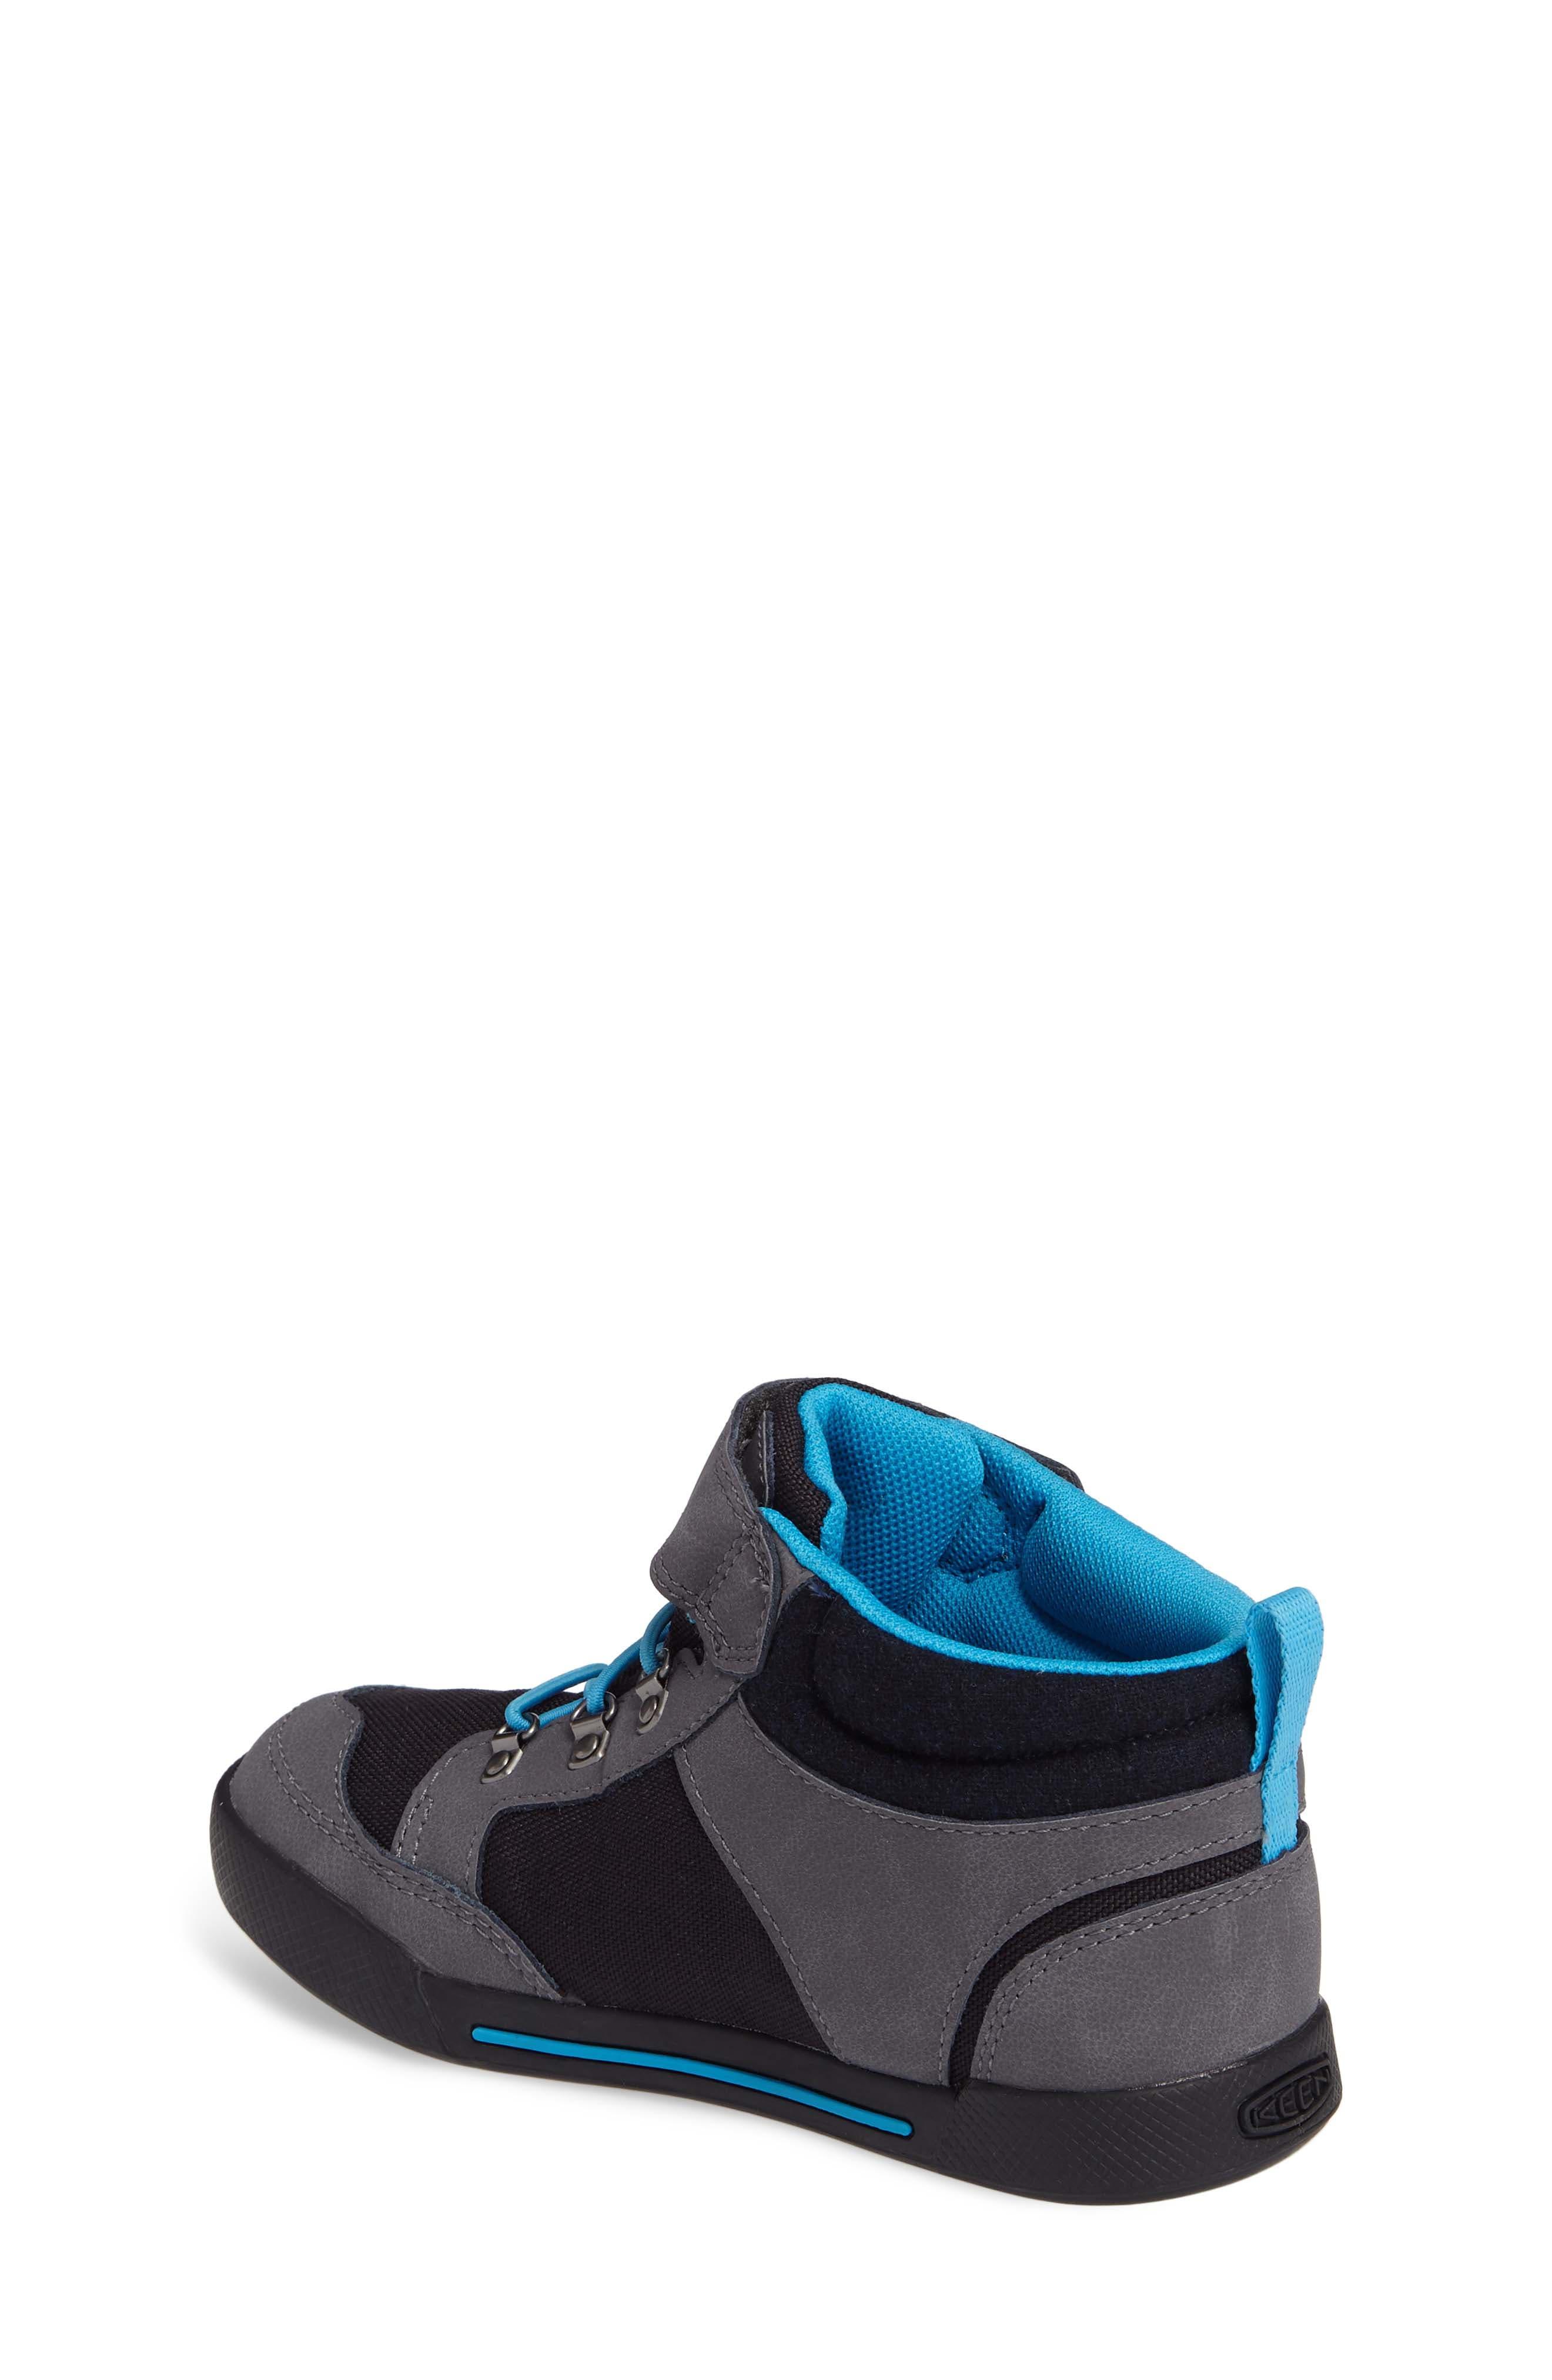 Encanto Wesley II High Top Sneaker,                             Alternate thumbnail 2, color,                             003